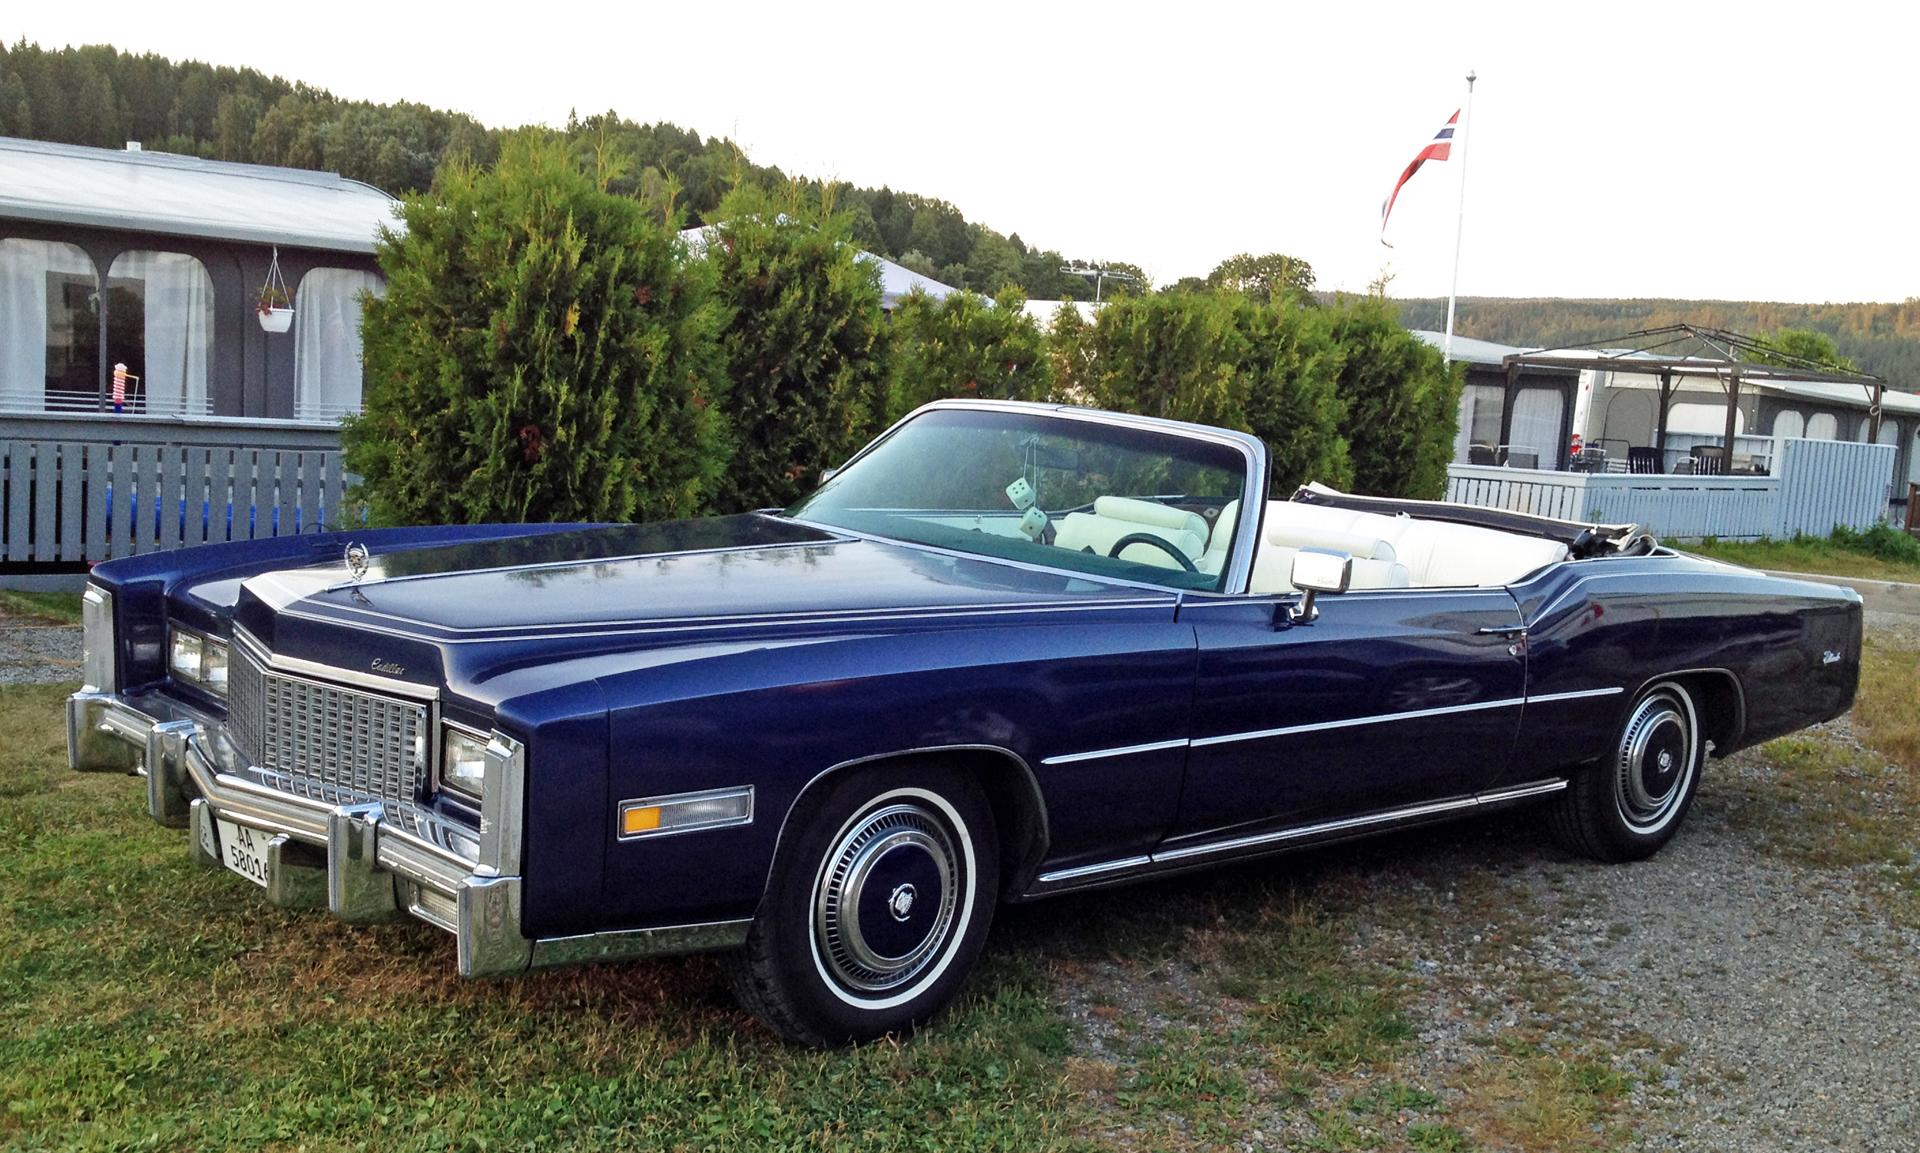 211-1976 Cadillac Fleetwood Eldorado convertible.